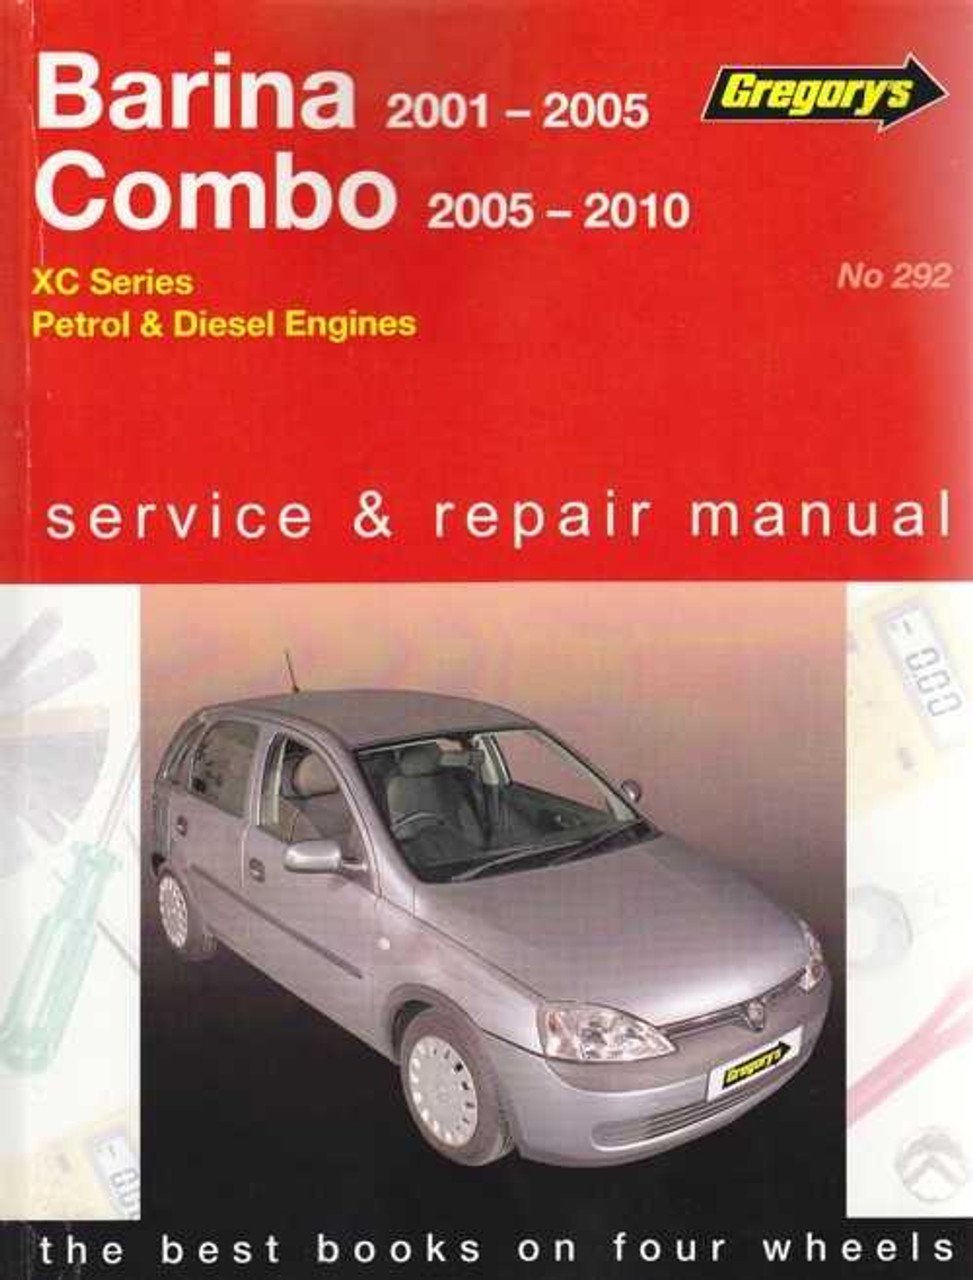 holden barina combo xc series petrol diesel 2001 2010 workshop rh automotobookshop com au Opel Cars Avto Opel